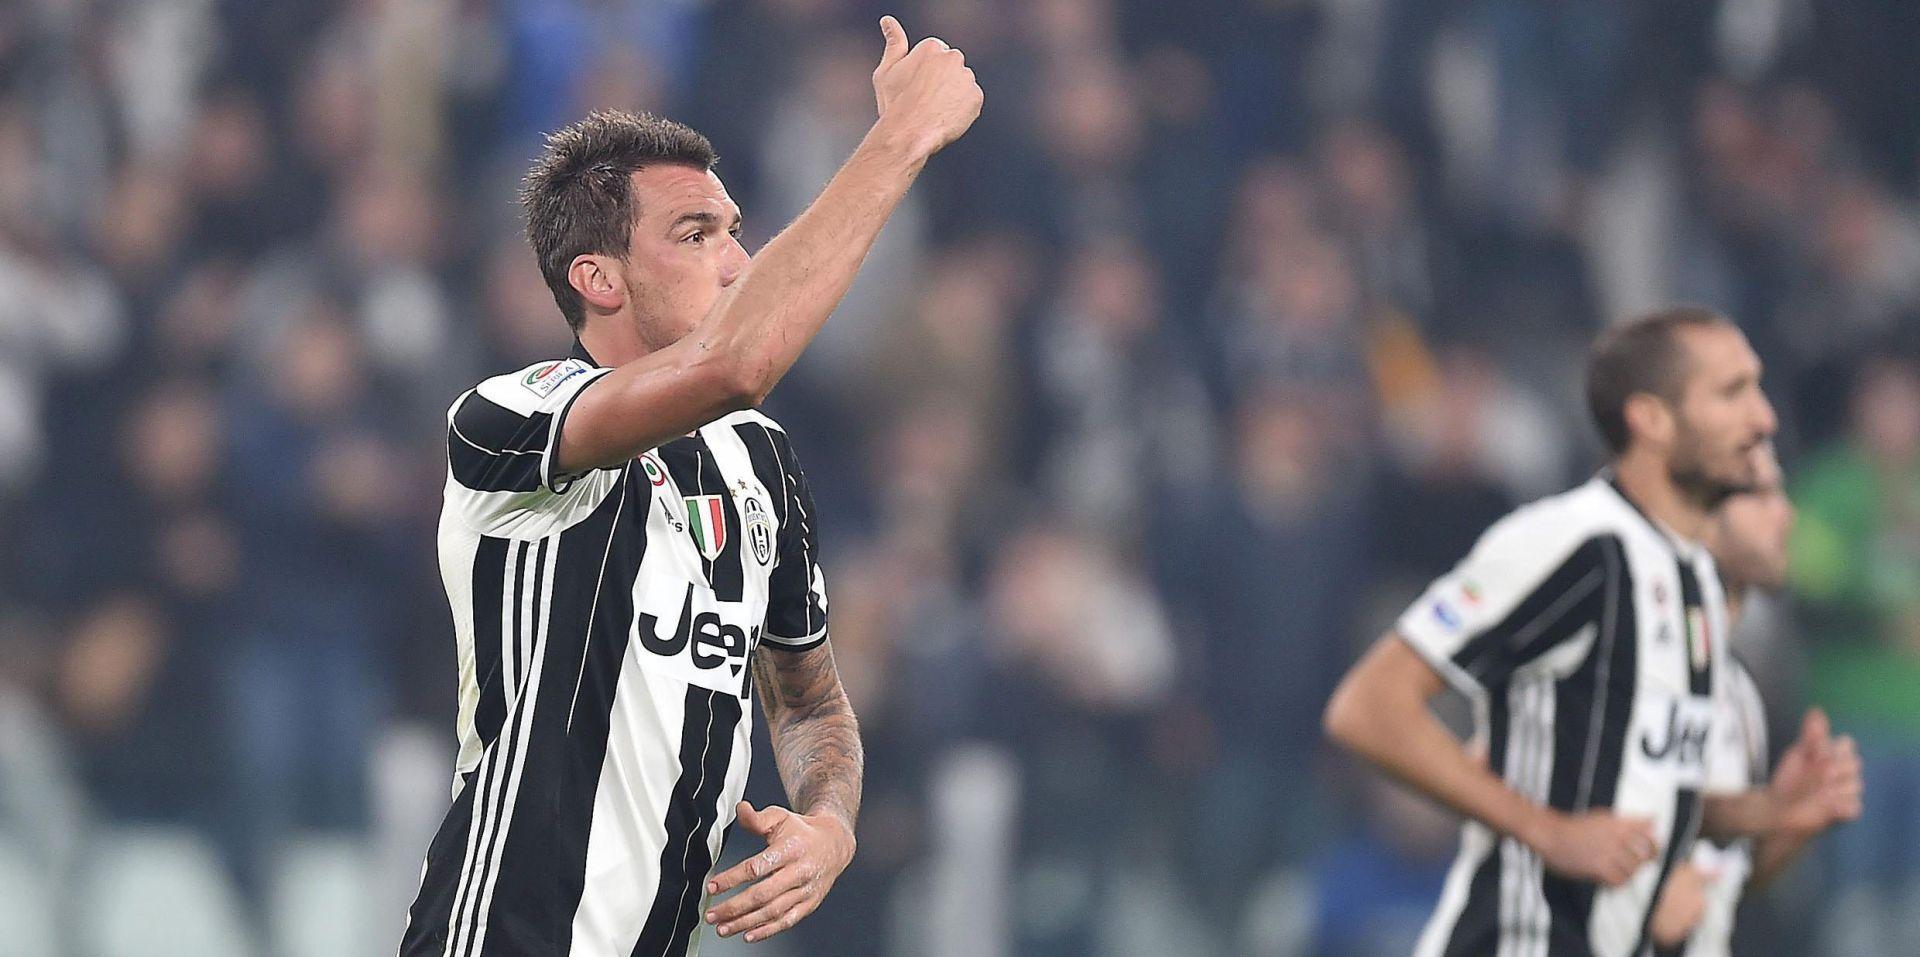 Gol Mandžukića u pobjedi Juventusa